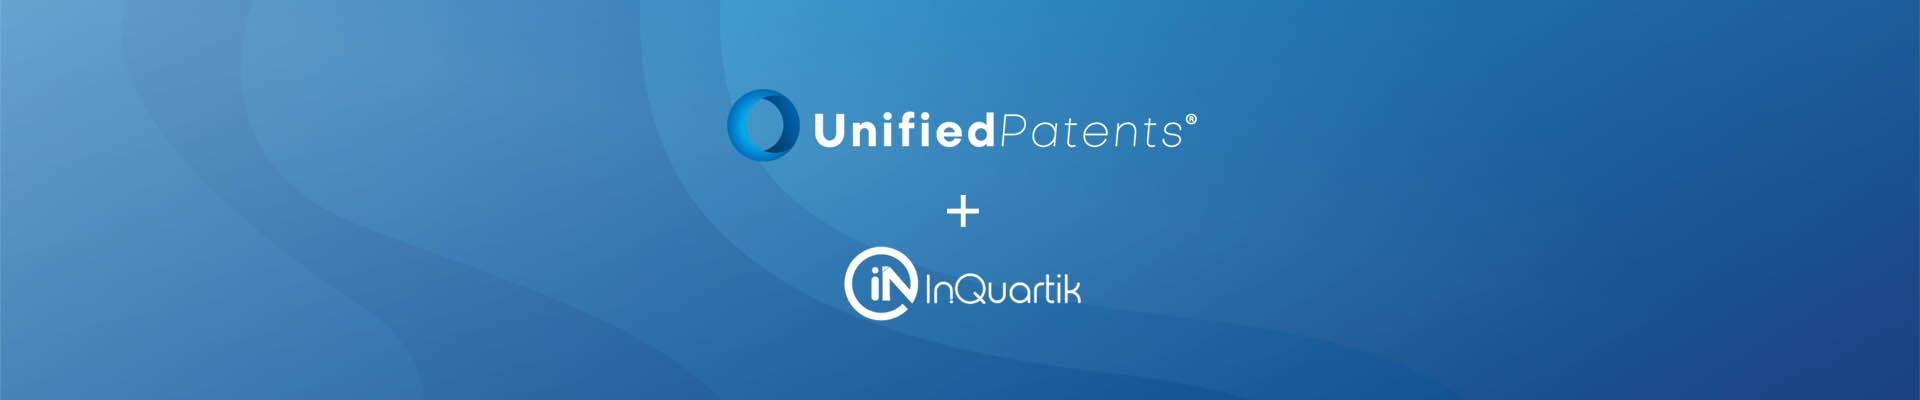 Unified Patentsが特許品質評価ソリューション強化に向けInQuartikと業務提携